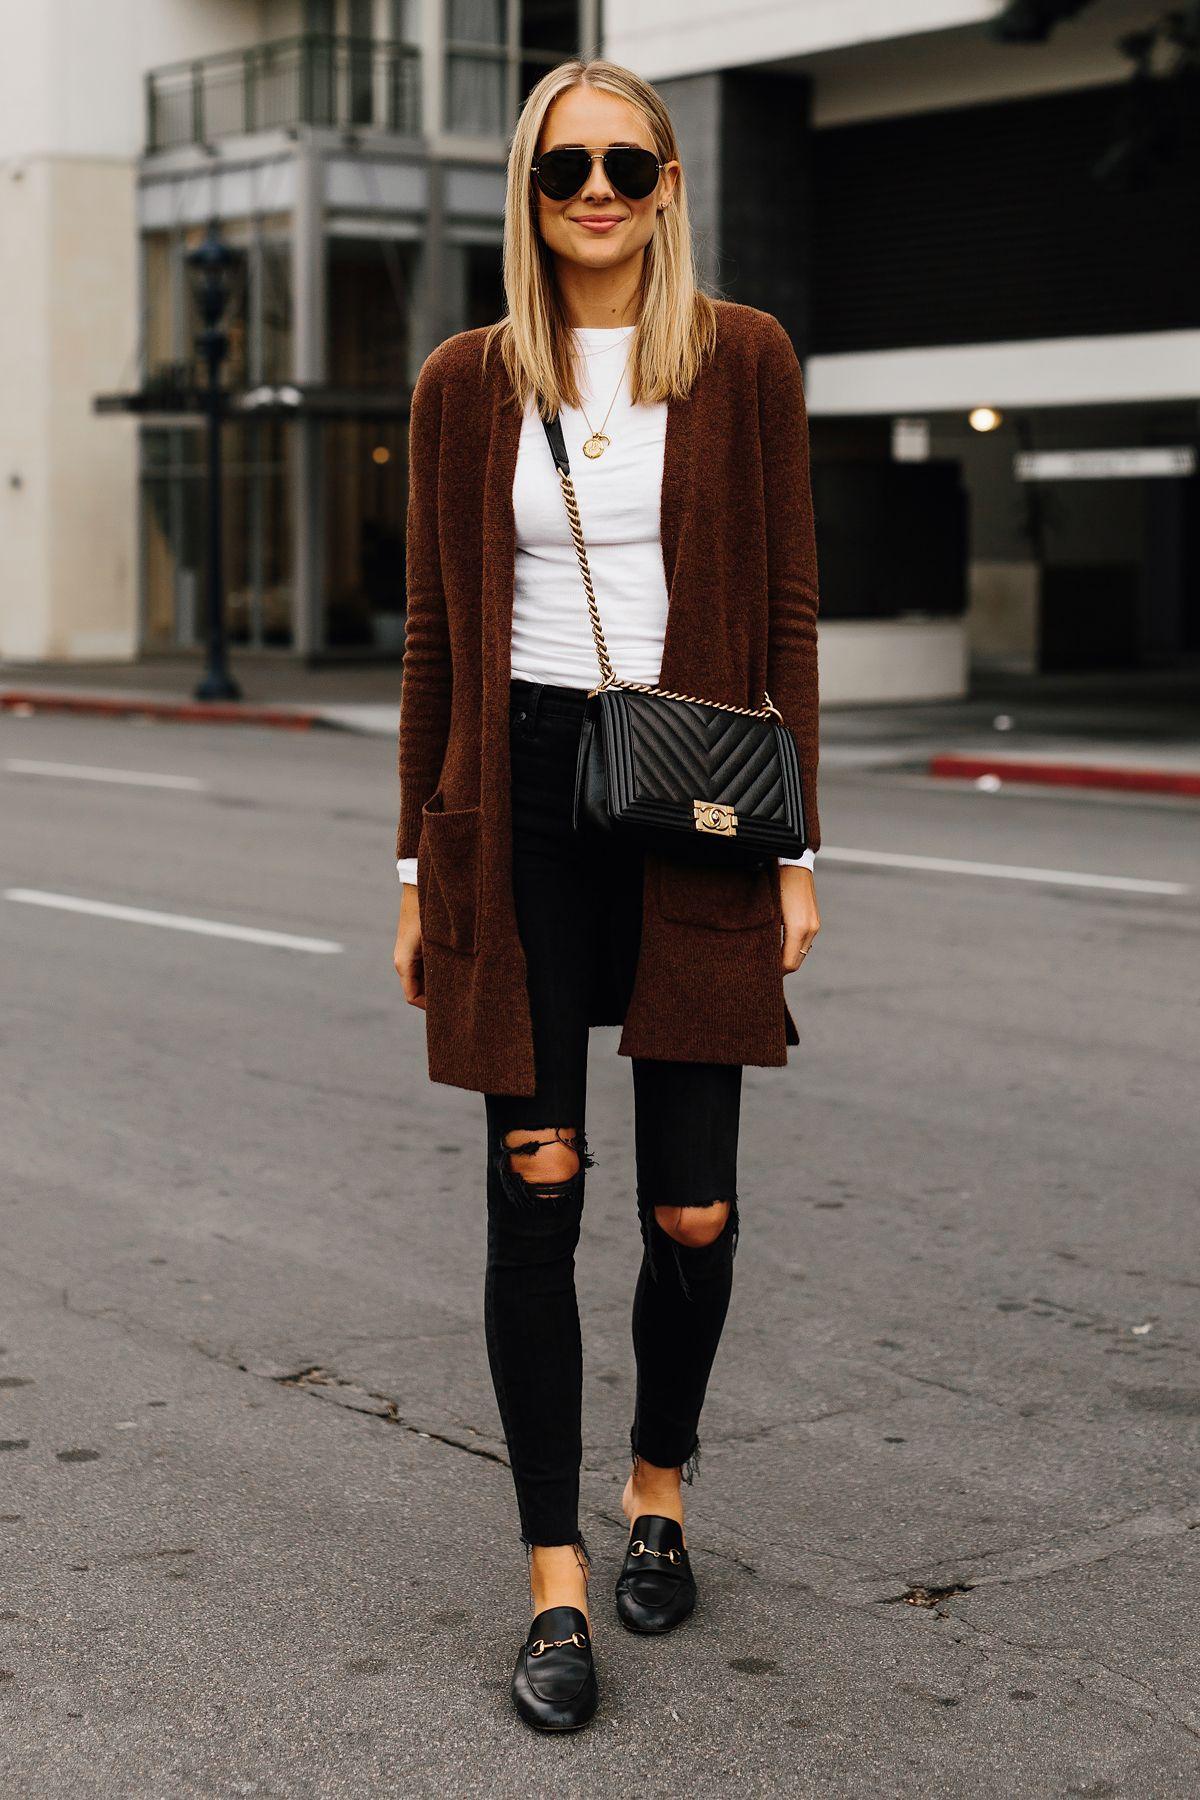 c0ce3e74165 ... Ripped Skinny Jeans Gucci Black Princetown Loafer Mules Chanel Black  Boy Bag Aviatro Sunglasses Fashion Jackson San Diego Fashion Blogger Street  Style